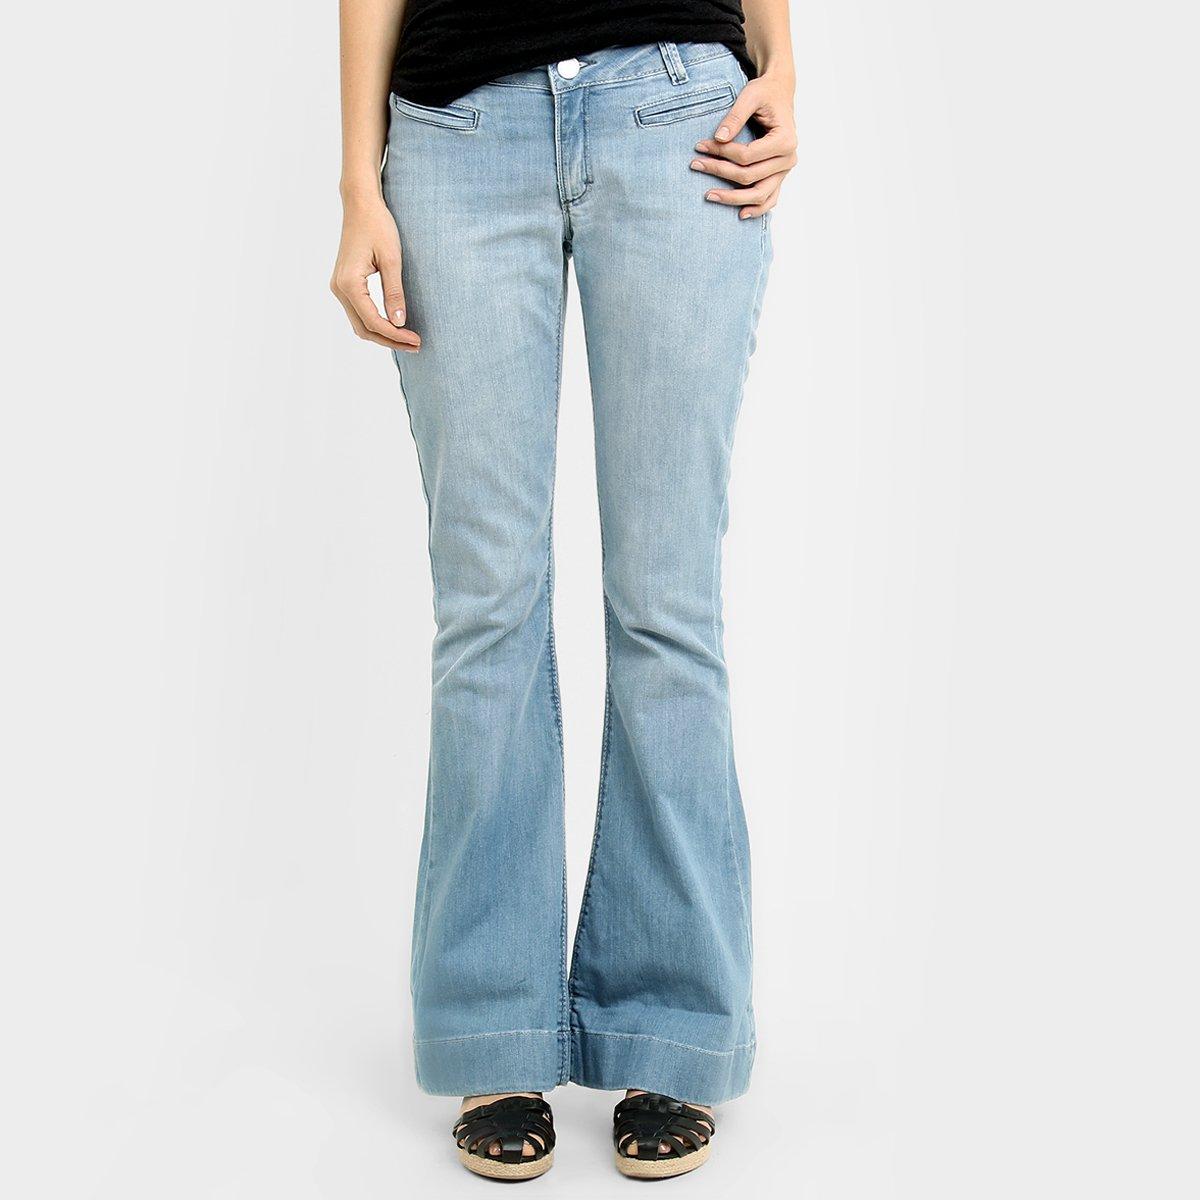 aa90b9a1c Calça Jeans Zune Flare Lavagem Clara   Netshoes